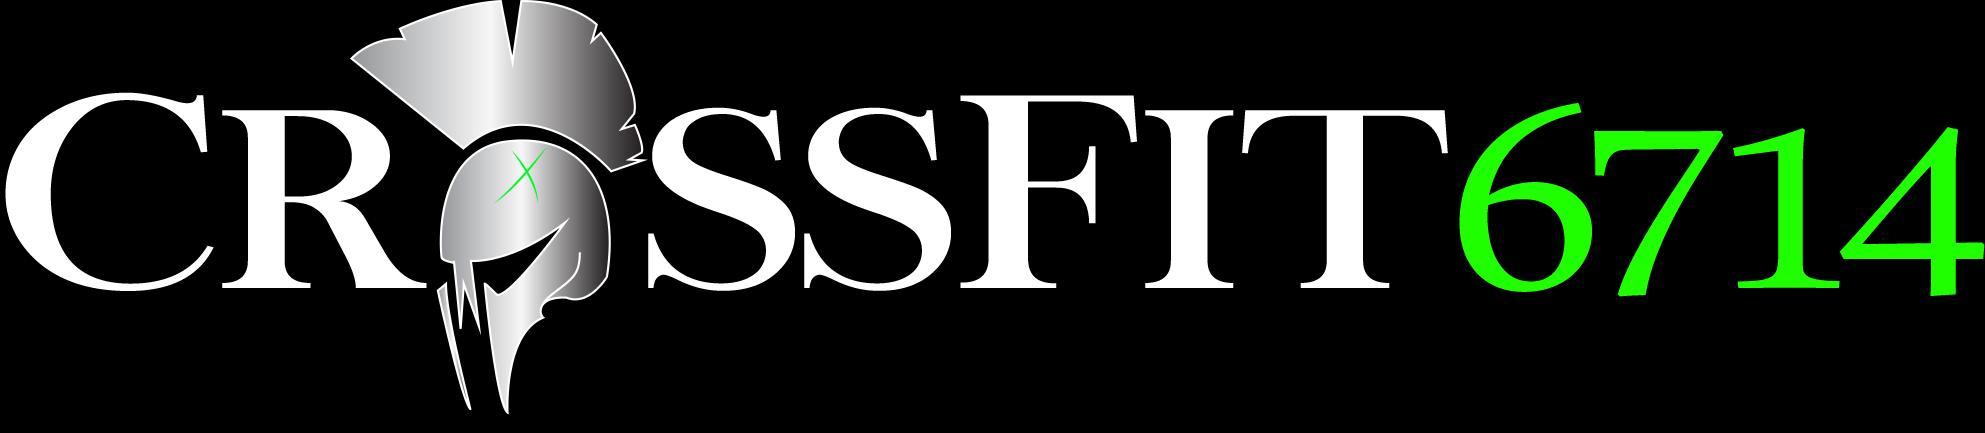 CROSSFIT 6714 FINAL transparent logo.png